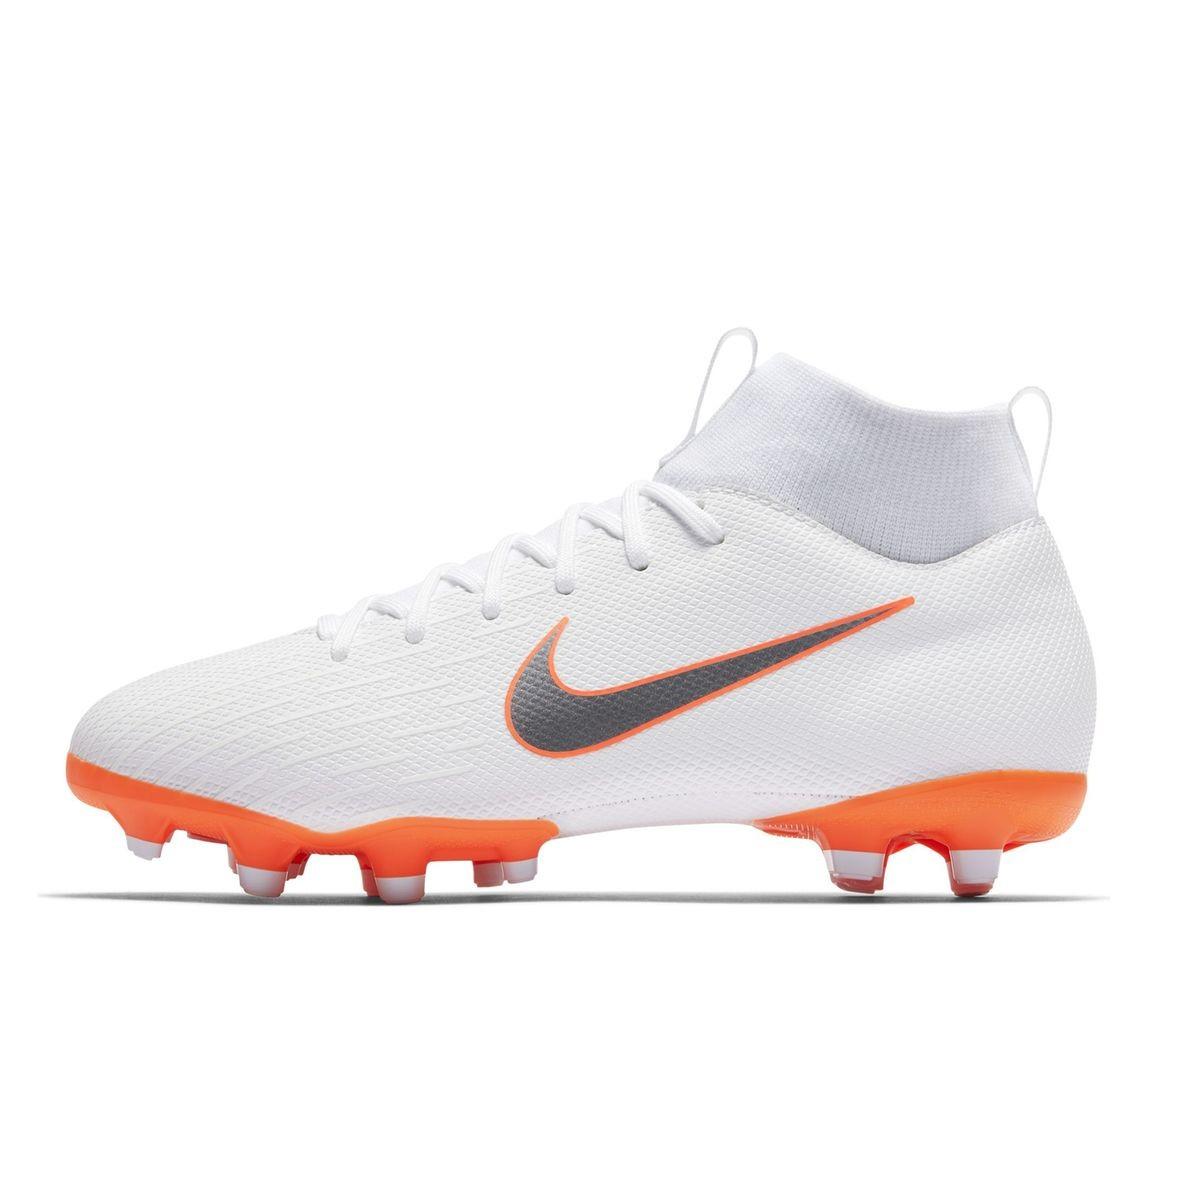 meilleur service fd06c 958b1 Chaussures football Nike Mercurial Superfly VI Academy DF MG ...